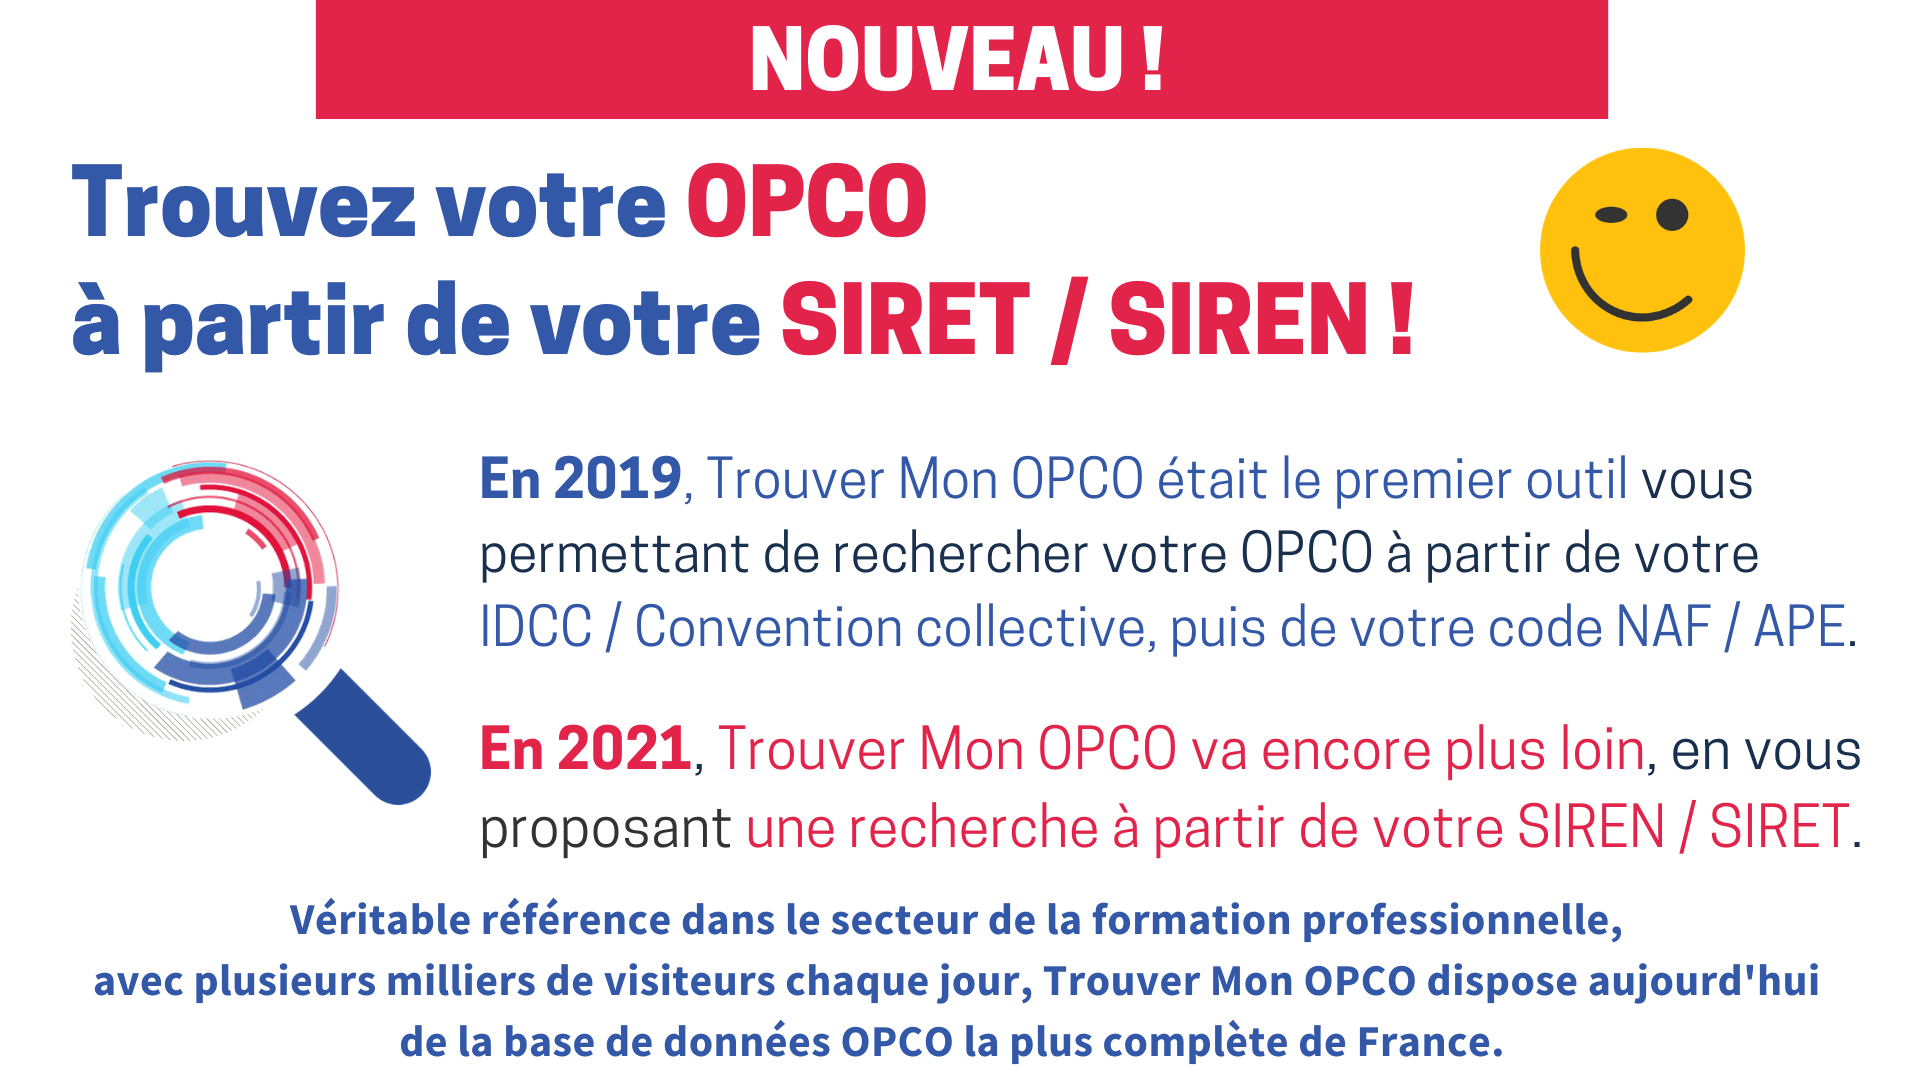 Annuaire OPCO SIREN SIRET